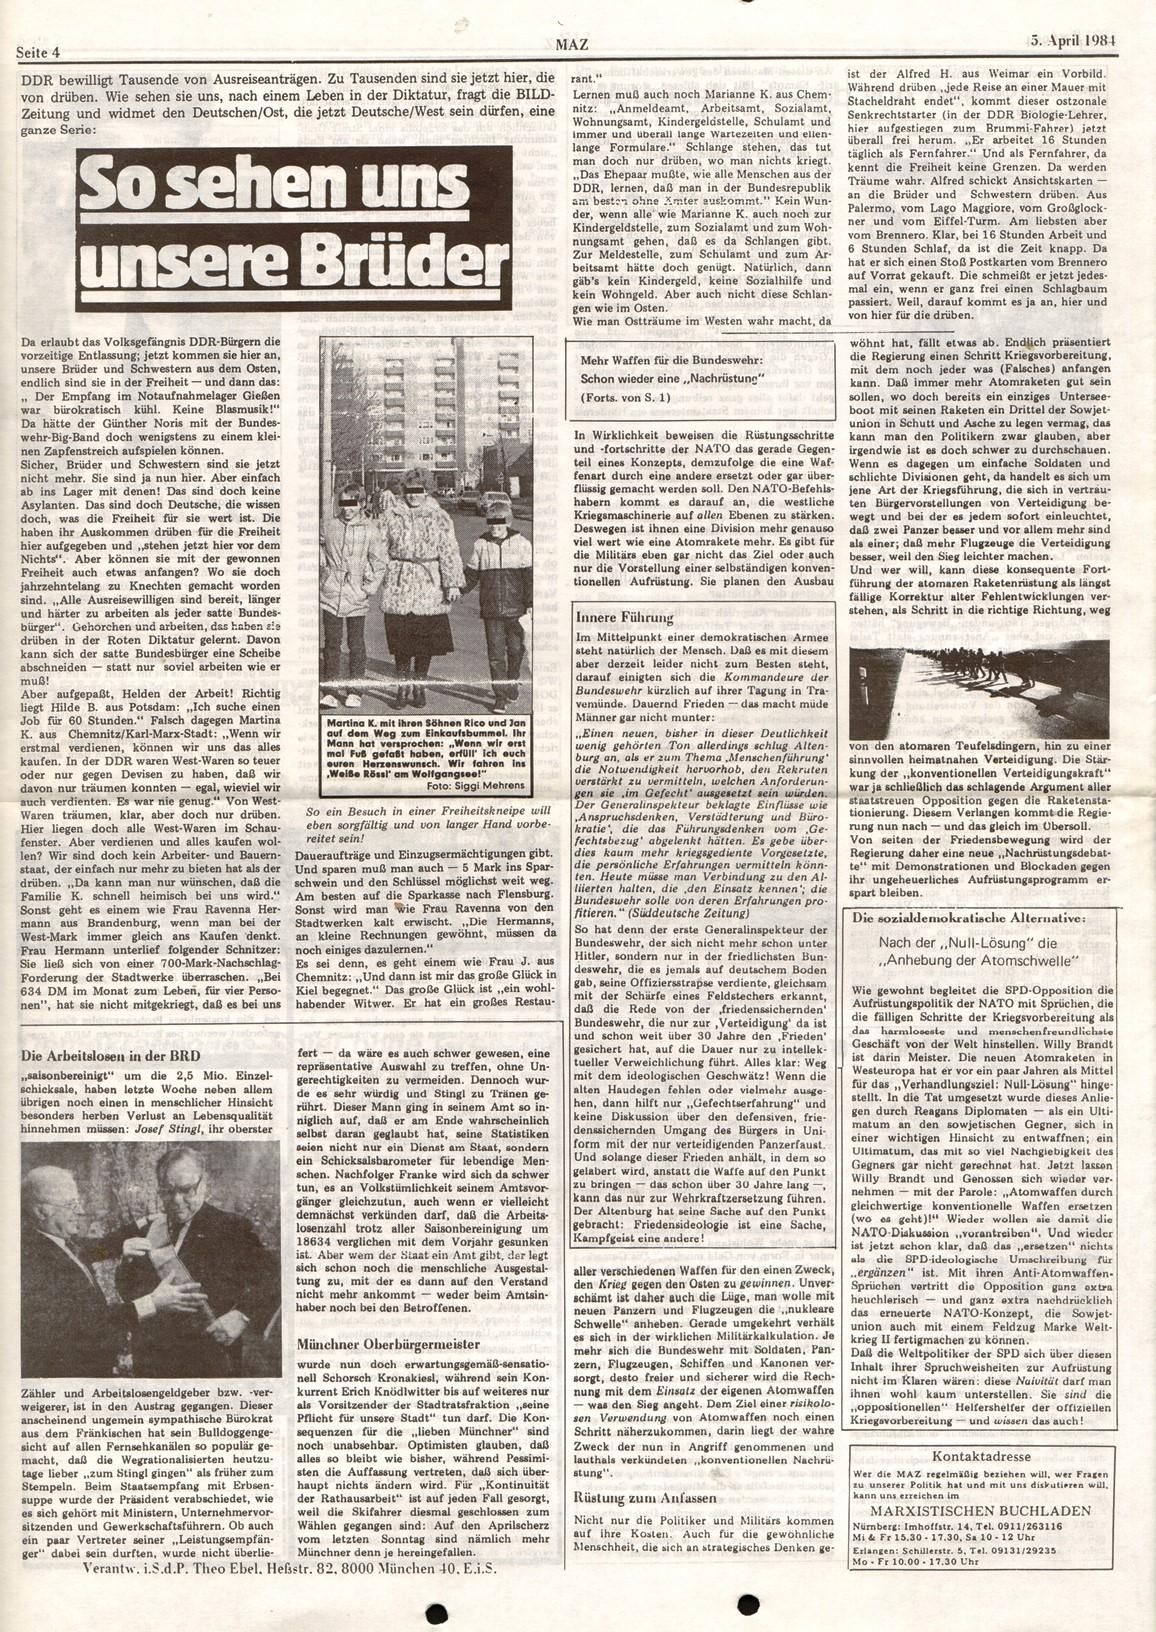 Nuernberg_Erlangen_MG_MAZ_19840405_04